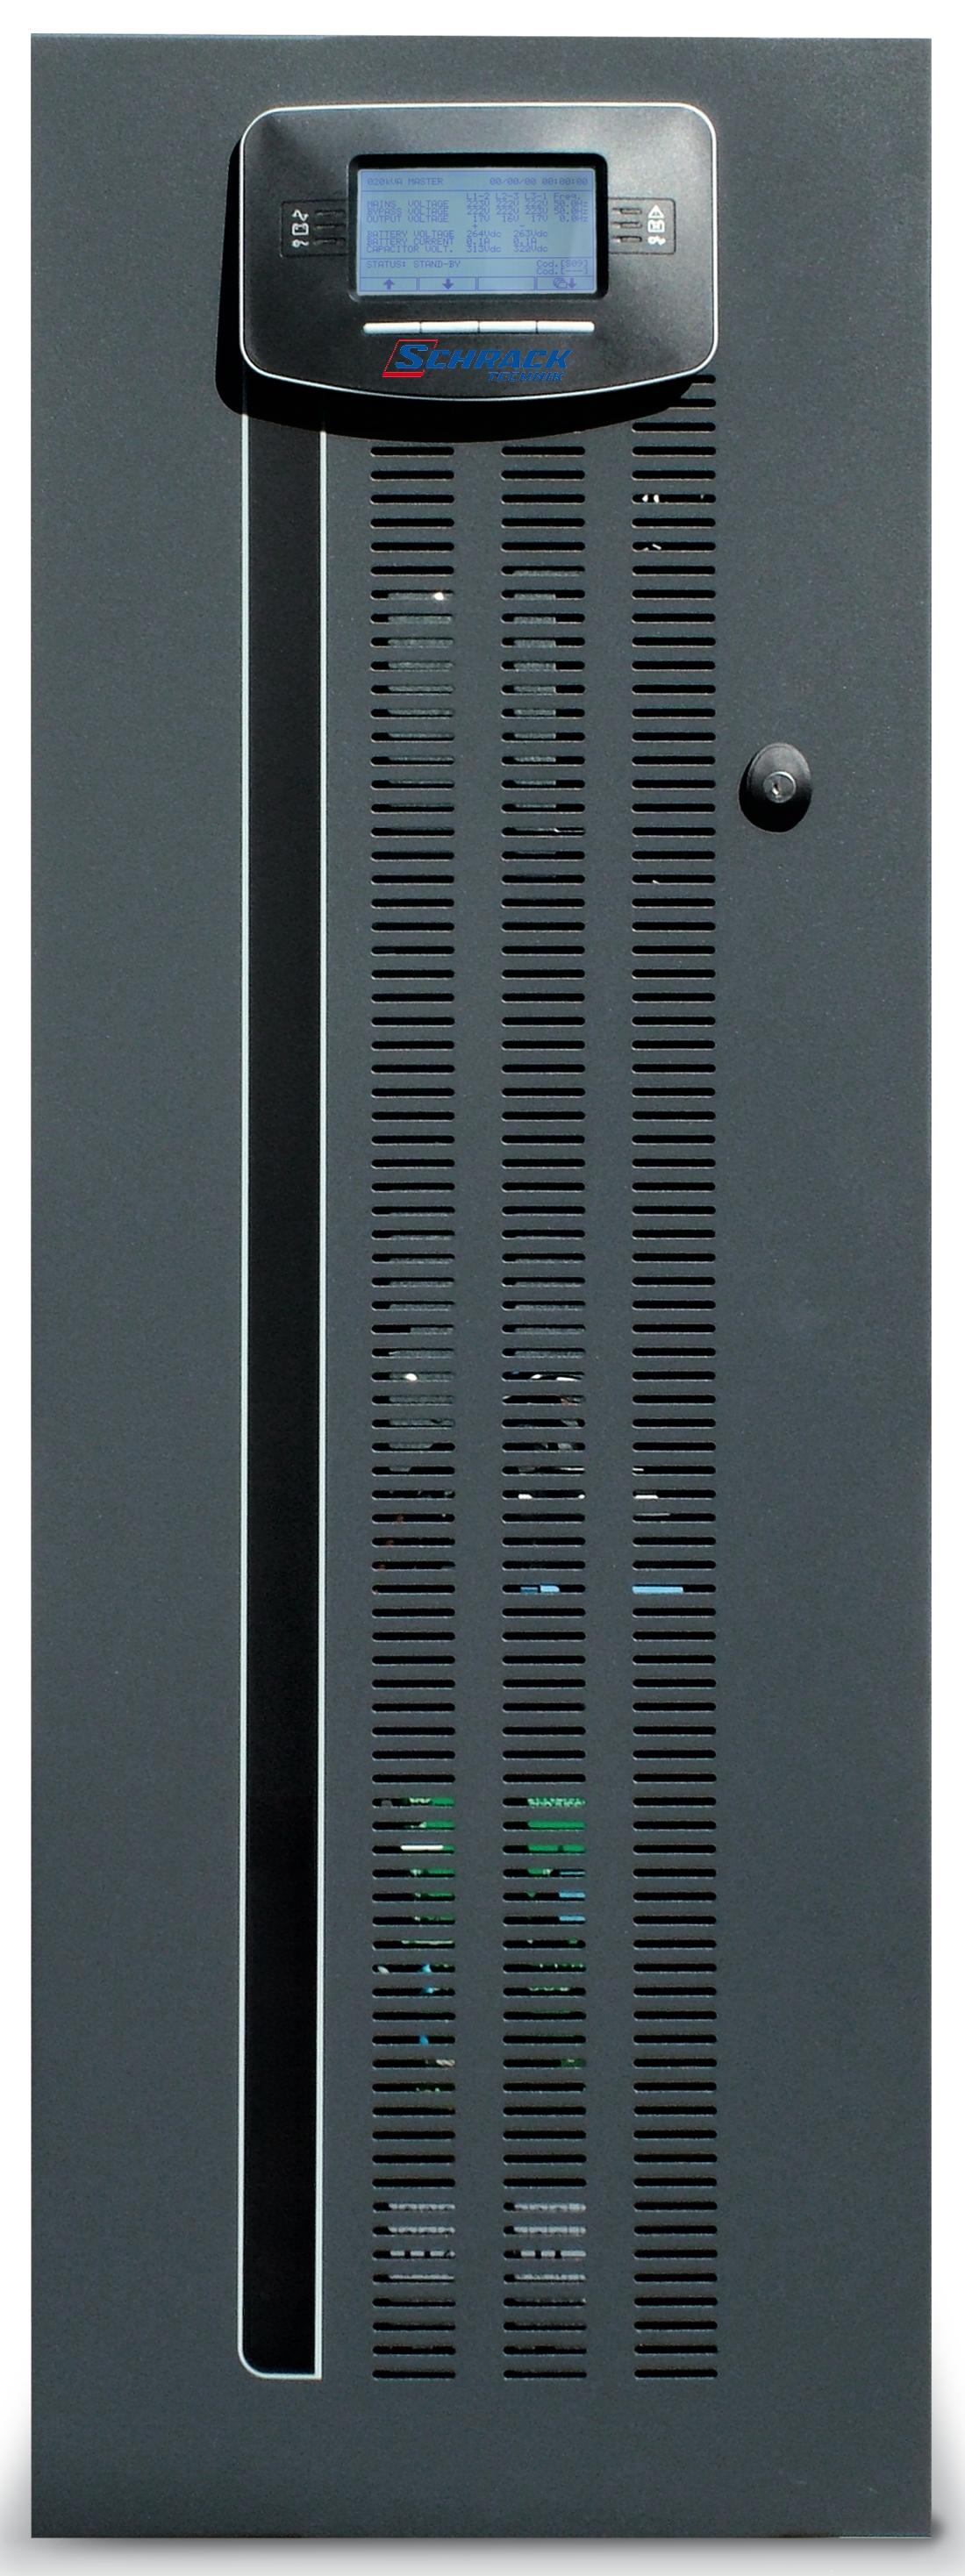 1 Stk USV AVARA Multi 20kVA 18kW 0Min. 3ph/3ph /Online USMLT20XA0